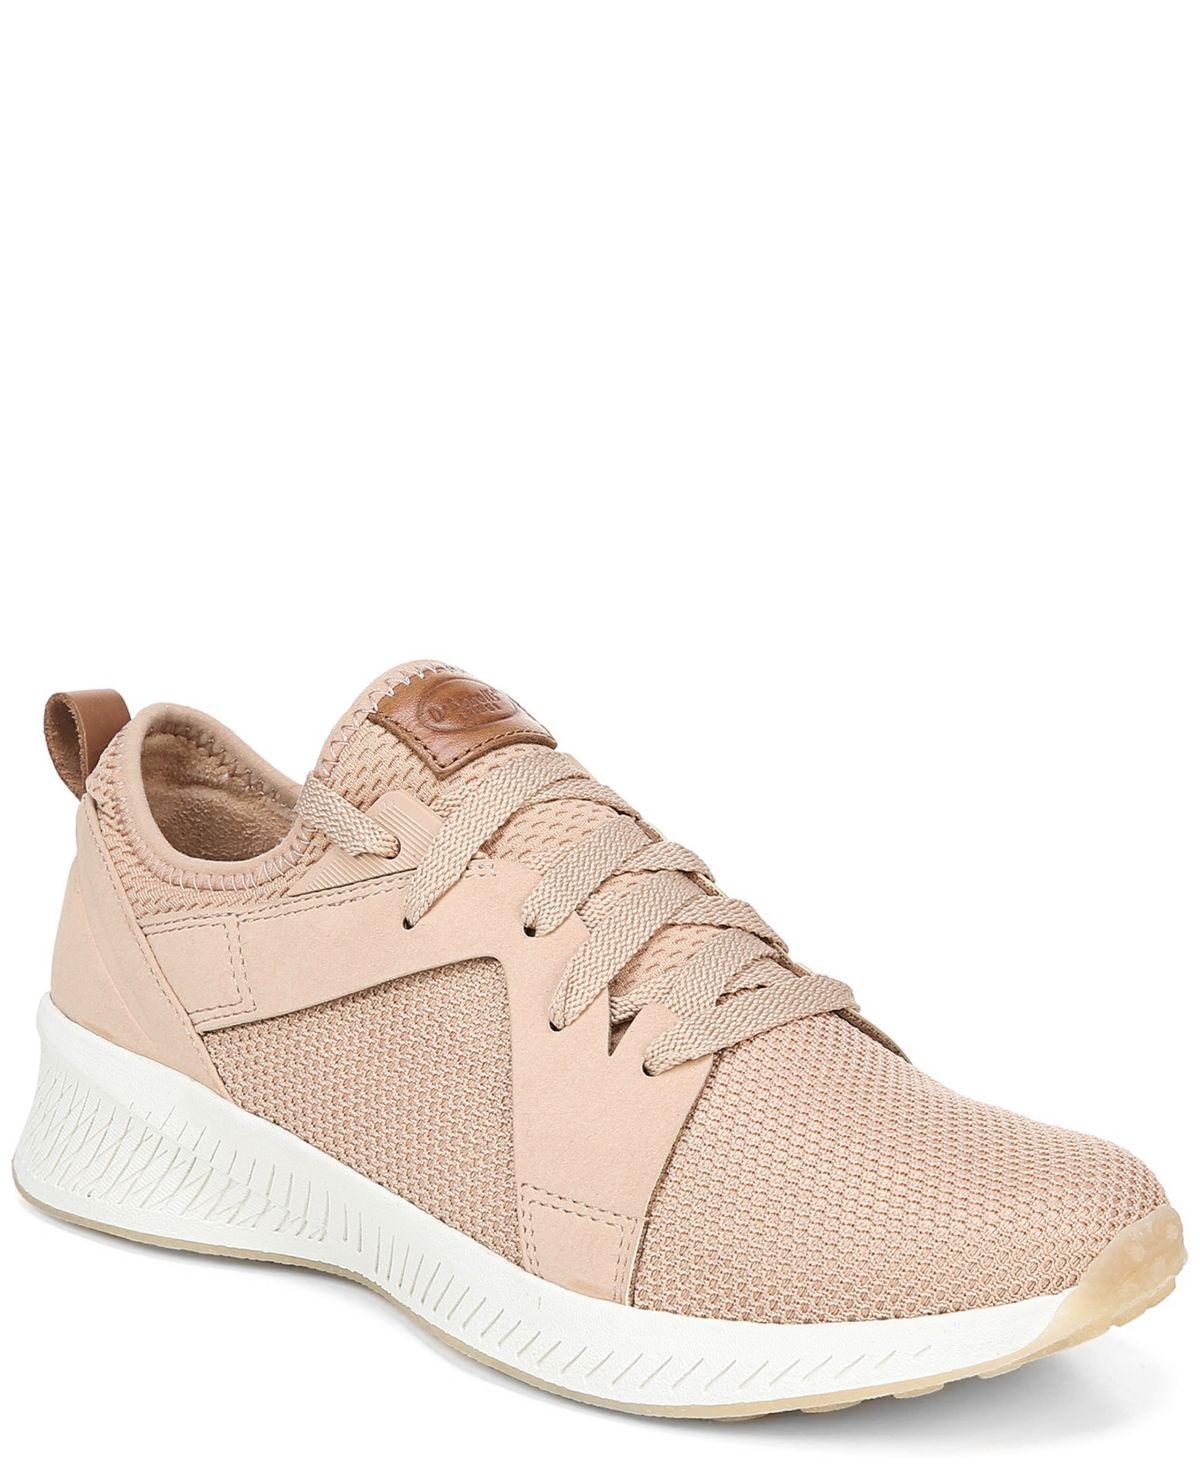 Athletic Shoes \u0026 Sneakers